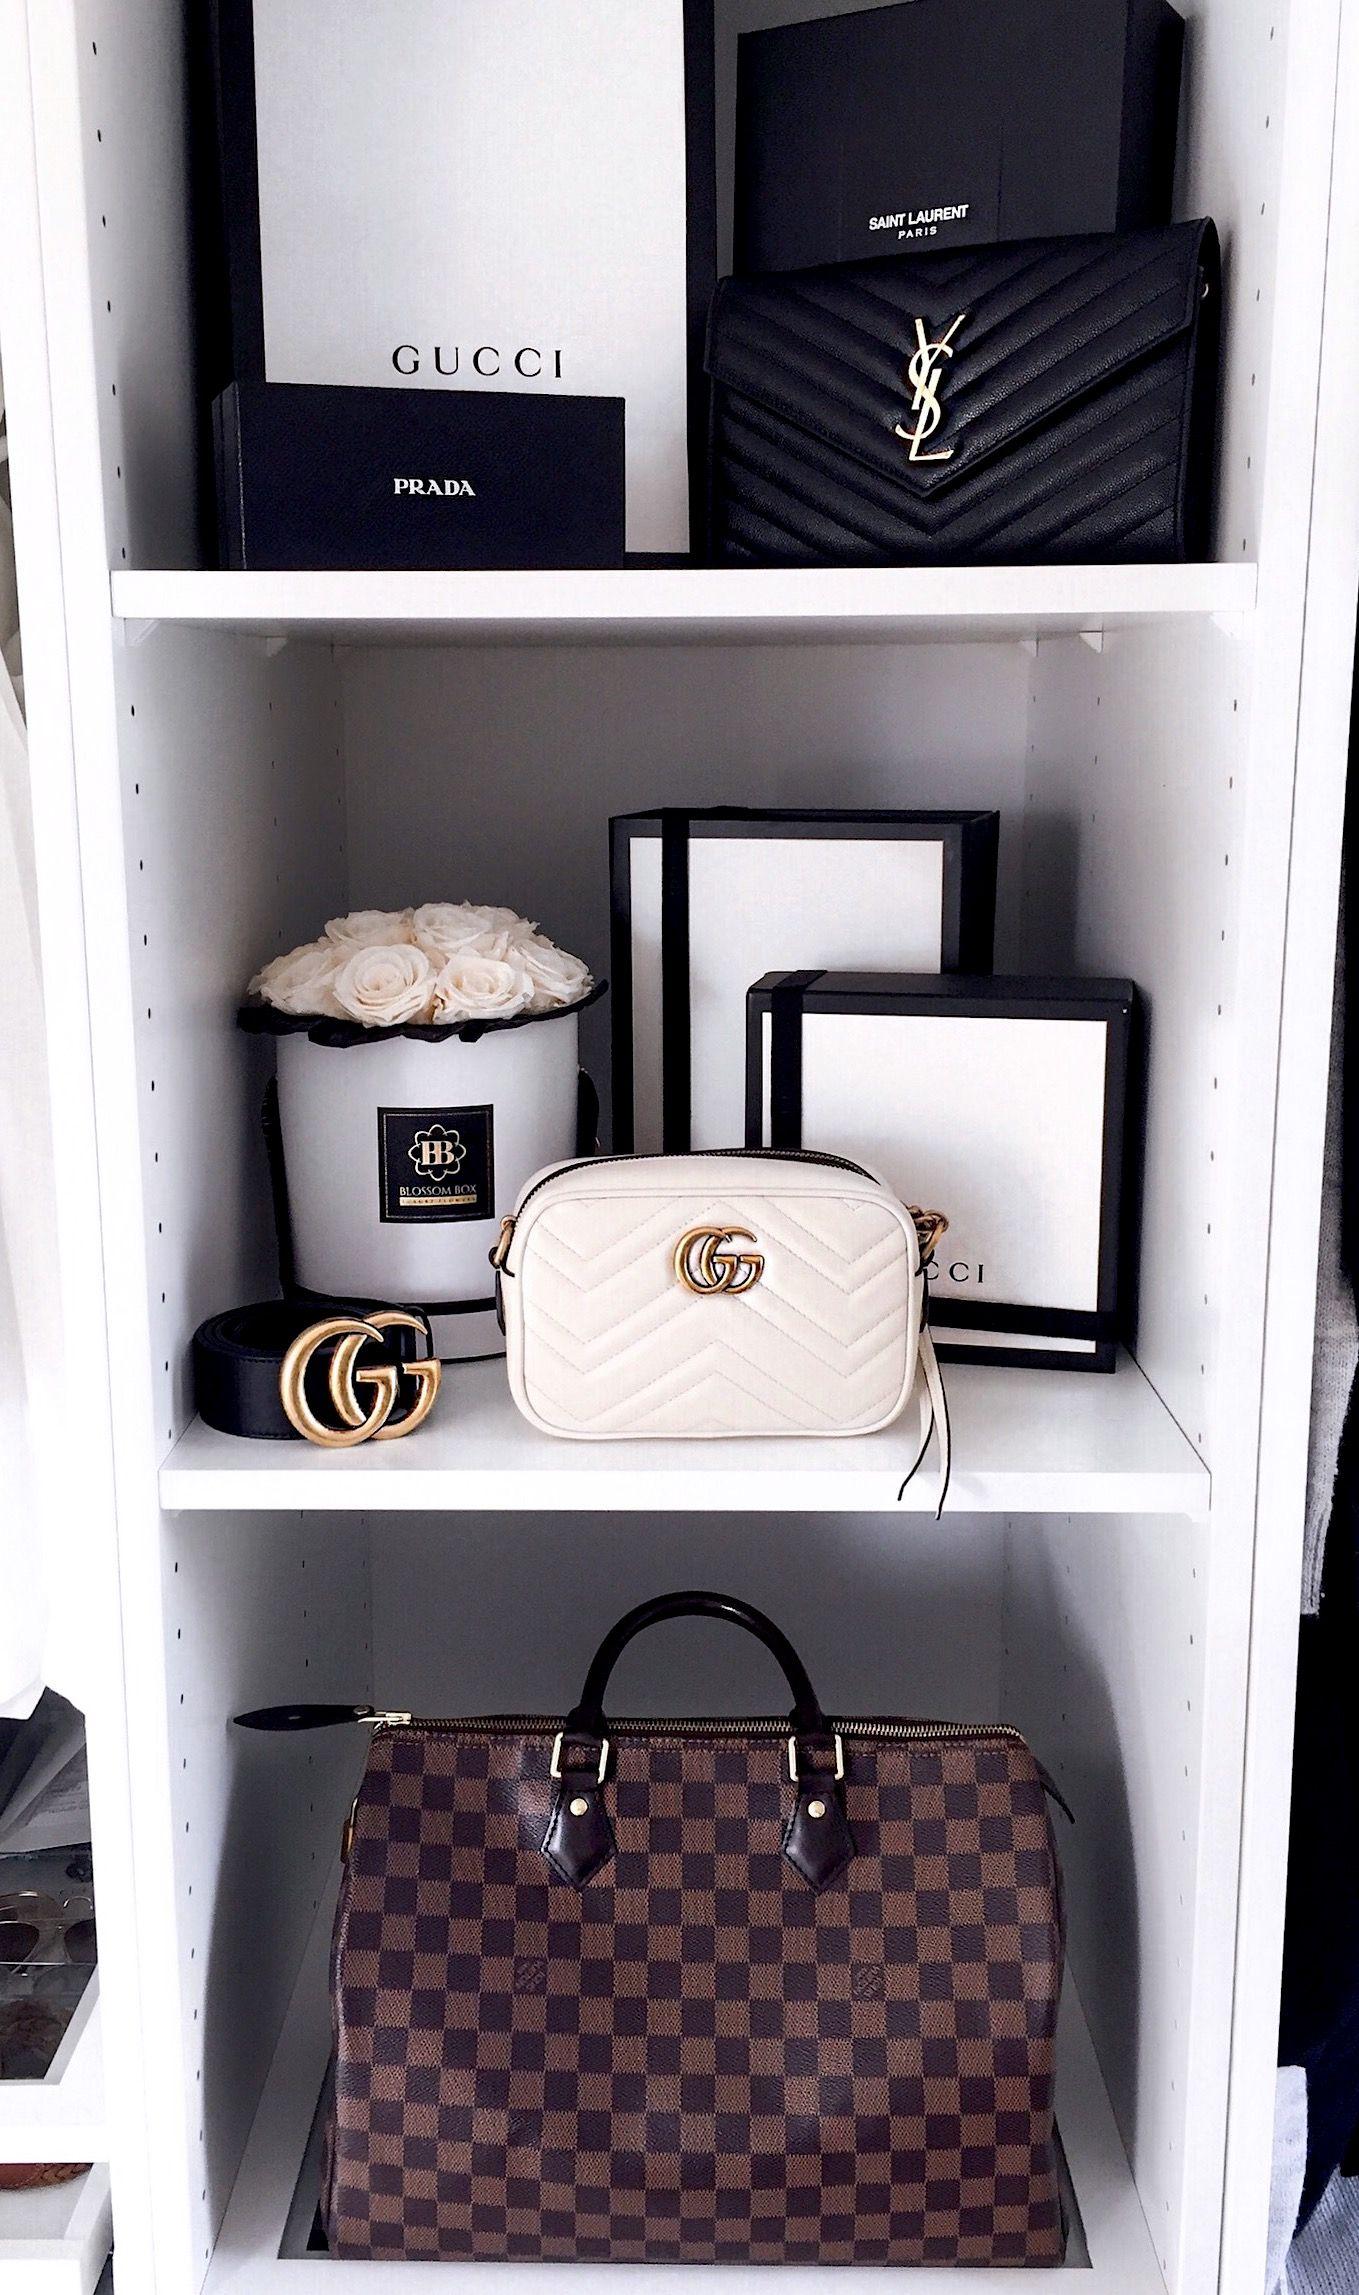 3fdef31e Wardrobe, Closet, Schrank, @my_philocaly Instagram, Pax System, Louis  Vuitton Speedy, Louis Vuitton, Gucci Marmont Mini white, Gucci Bag, Gucci  Belt, ...